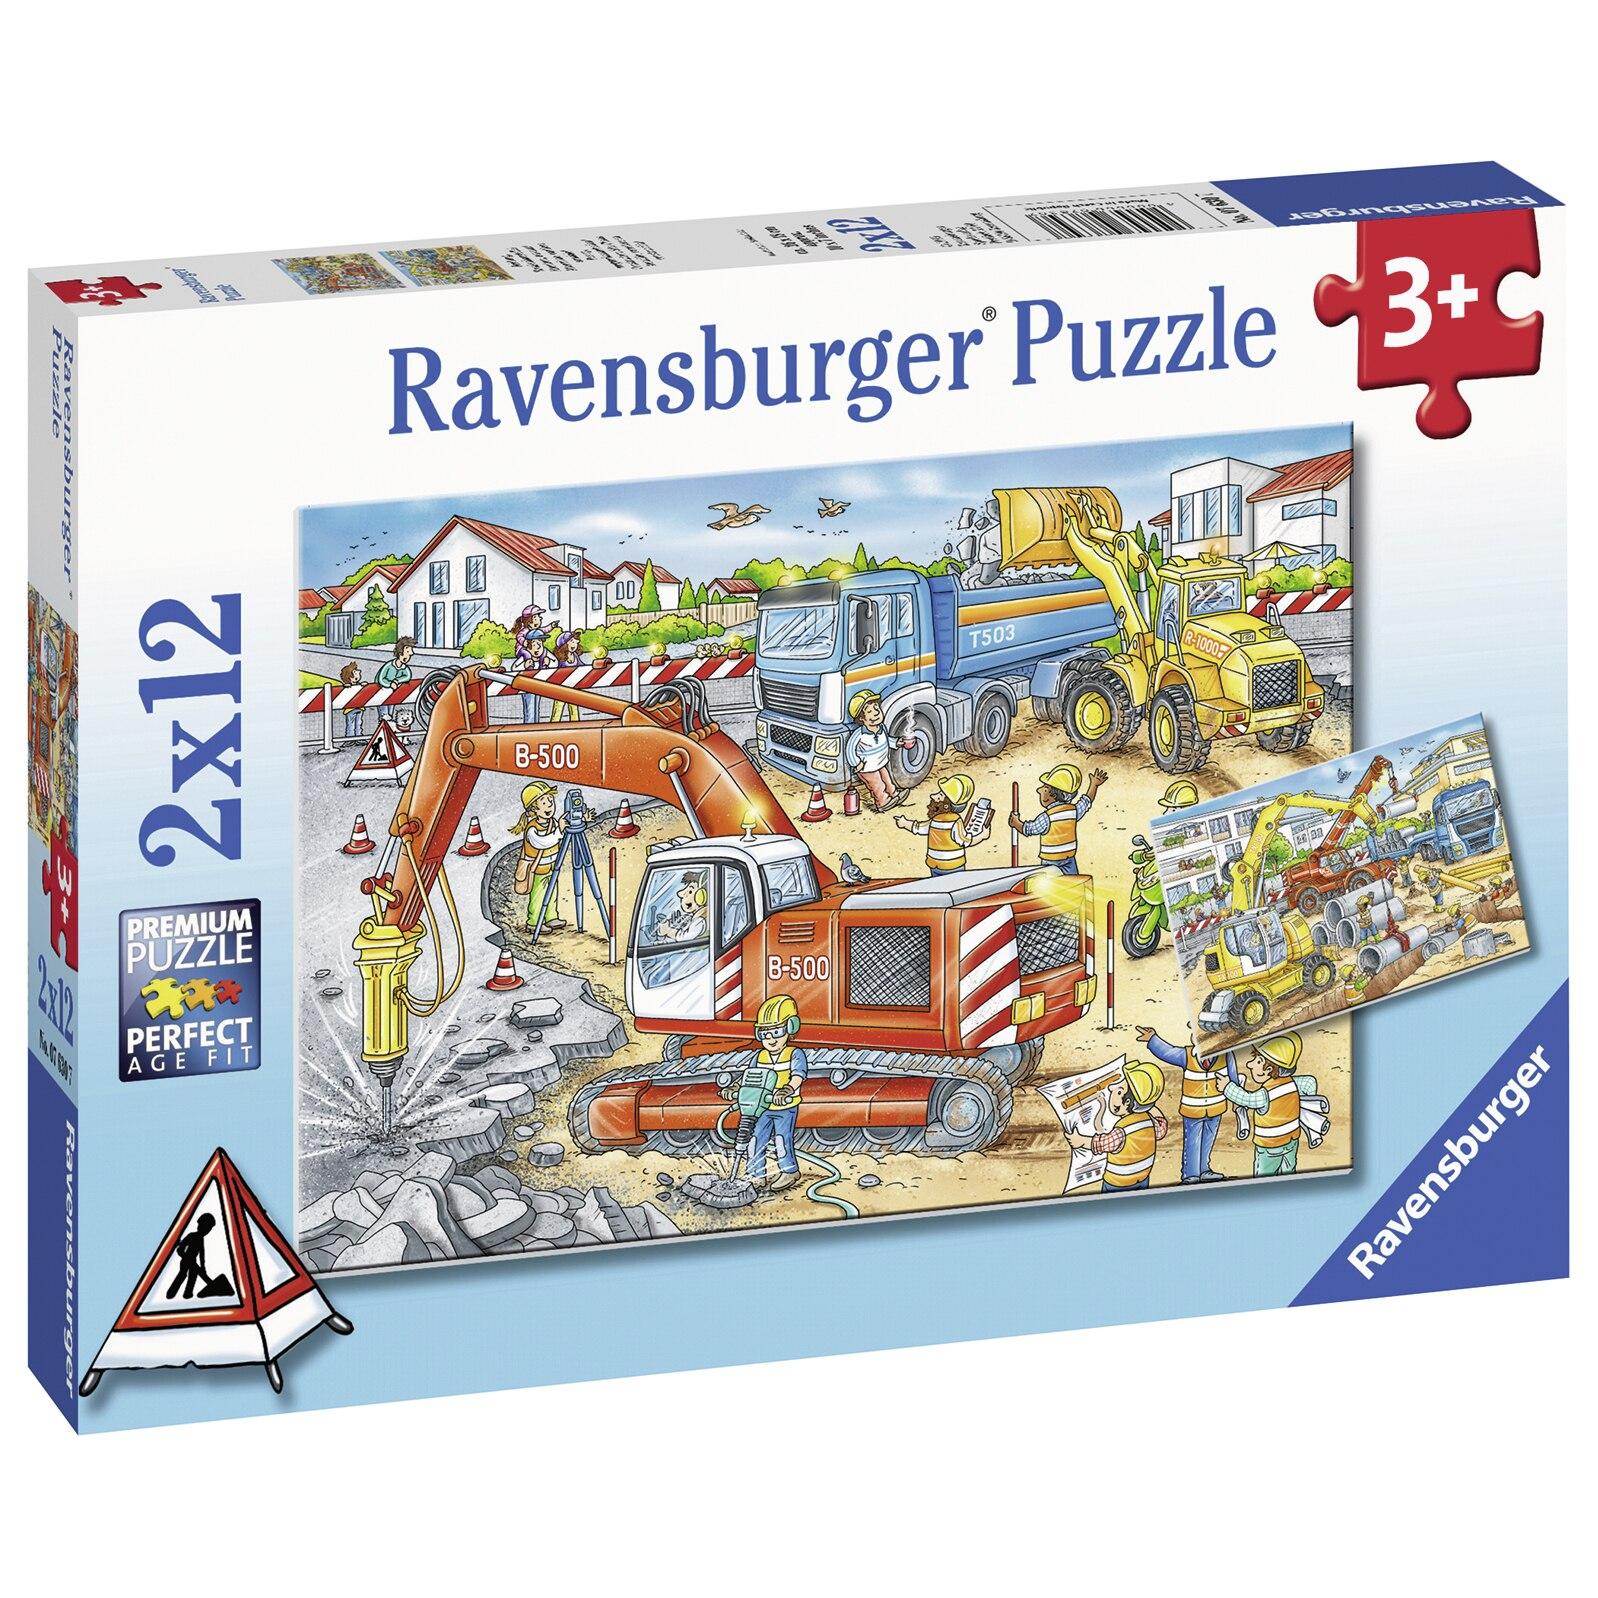 Fotografie Puzzle Ravensburger - Santier in lucru, 2 in 1, 2x12 piese